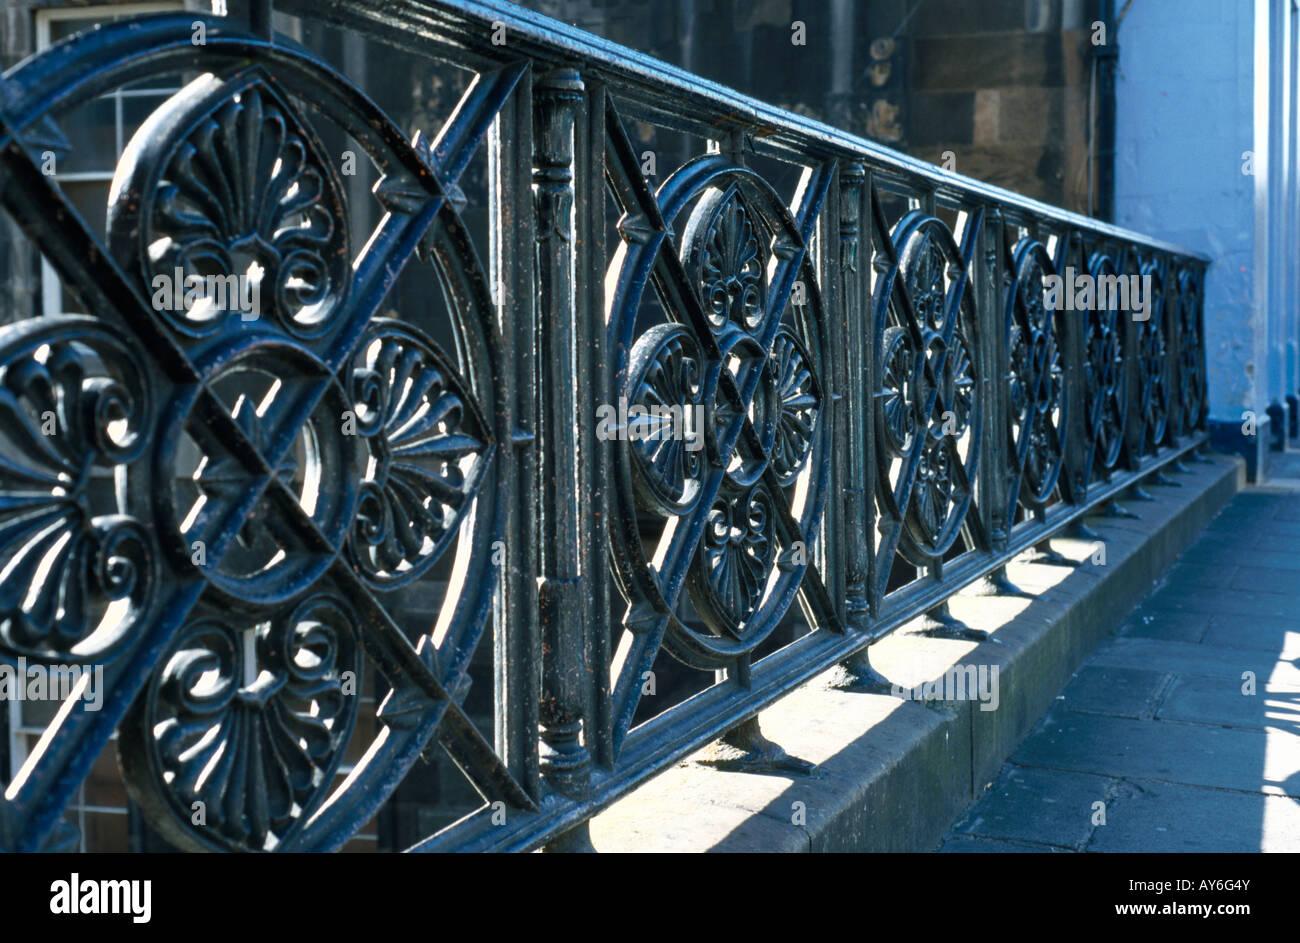 Cast-iron railings in Edinburgh, Scotland - Stock Image